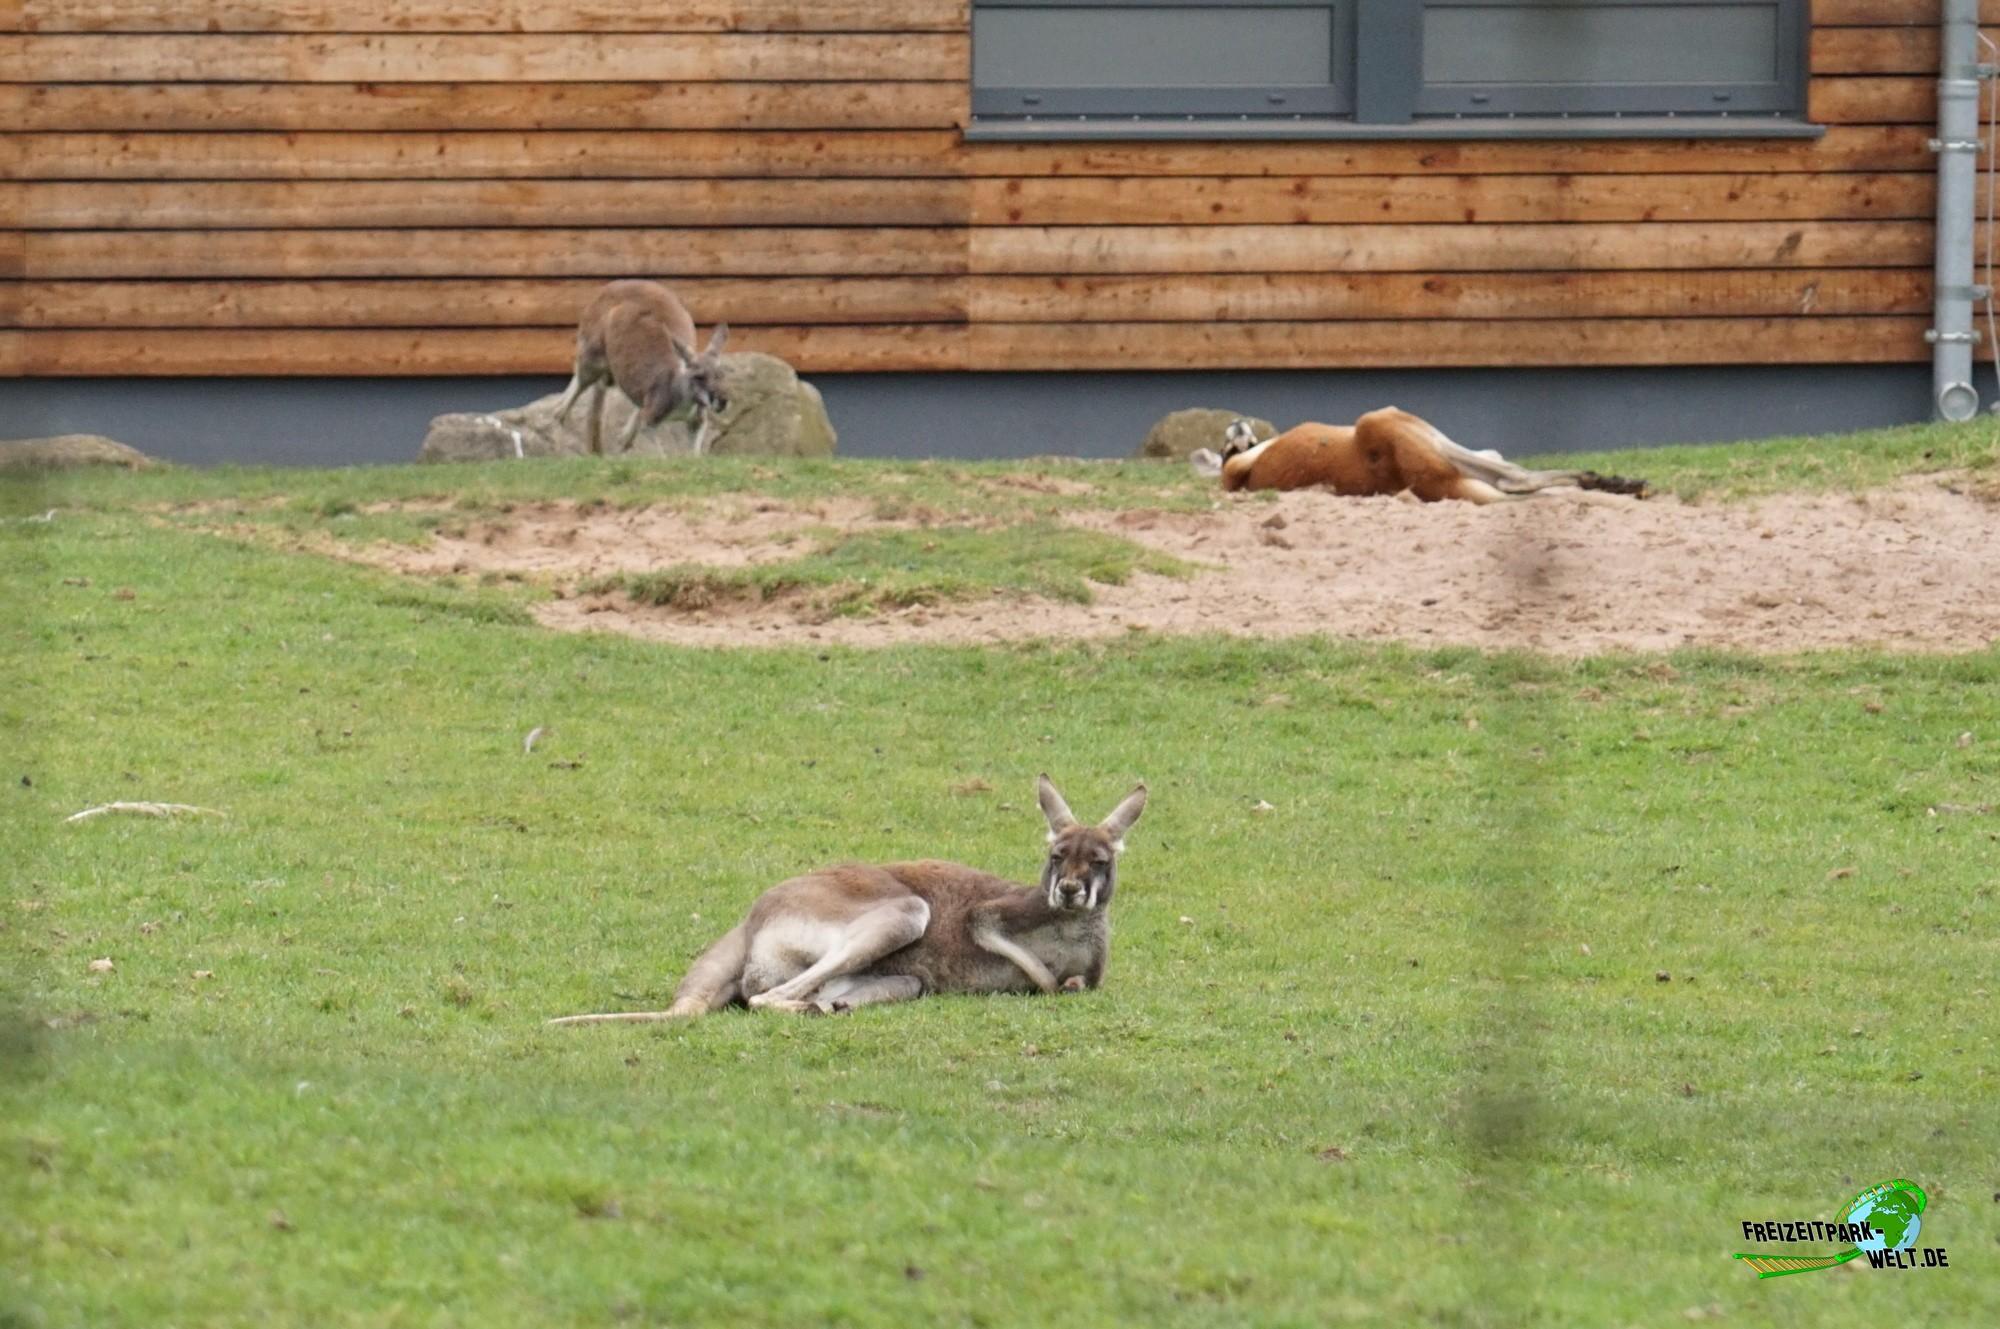 rotes riesenk nguru zoo dortmund freizeitpark. Black Bedroom Furniture Sets. Home Design Ideas